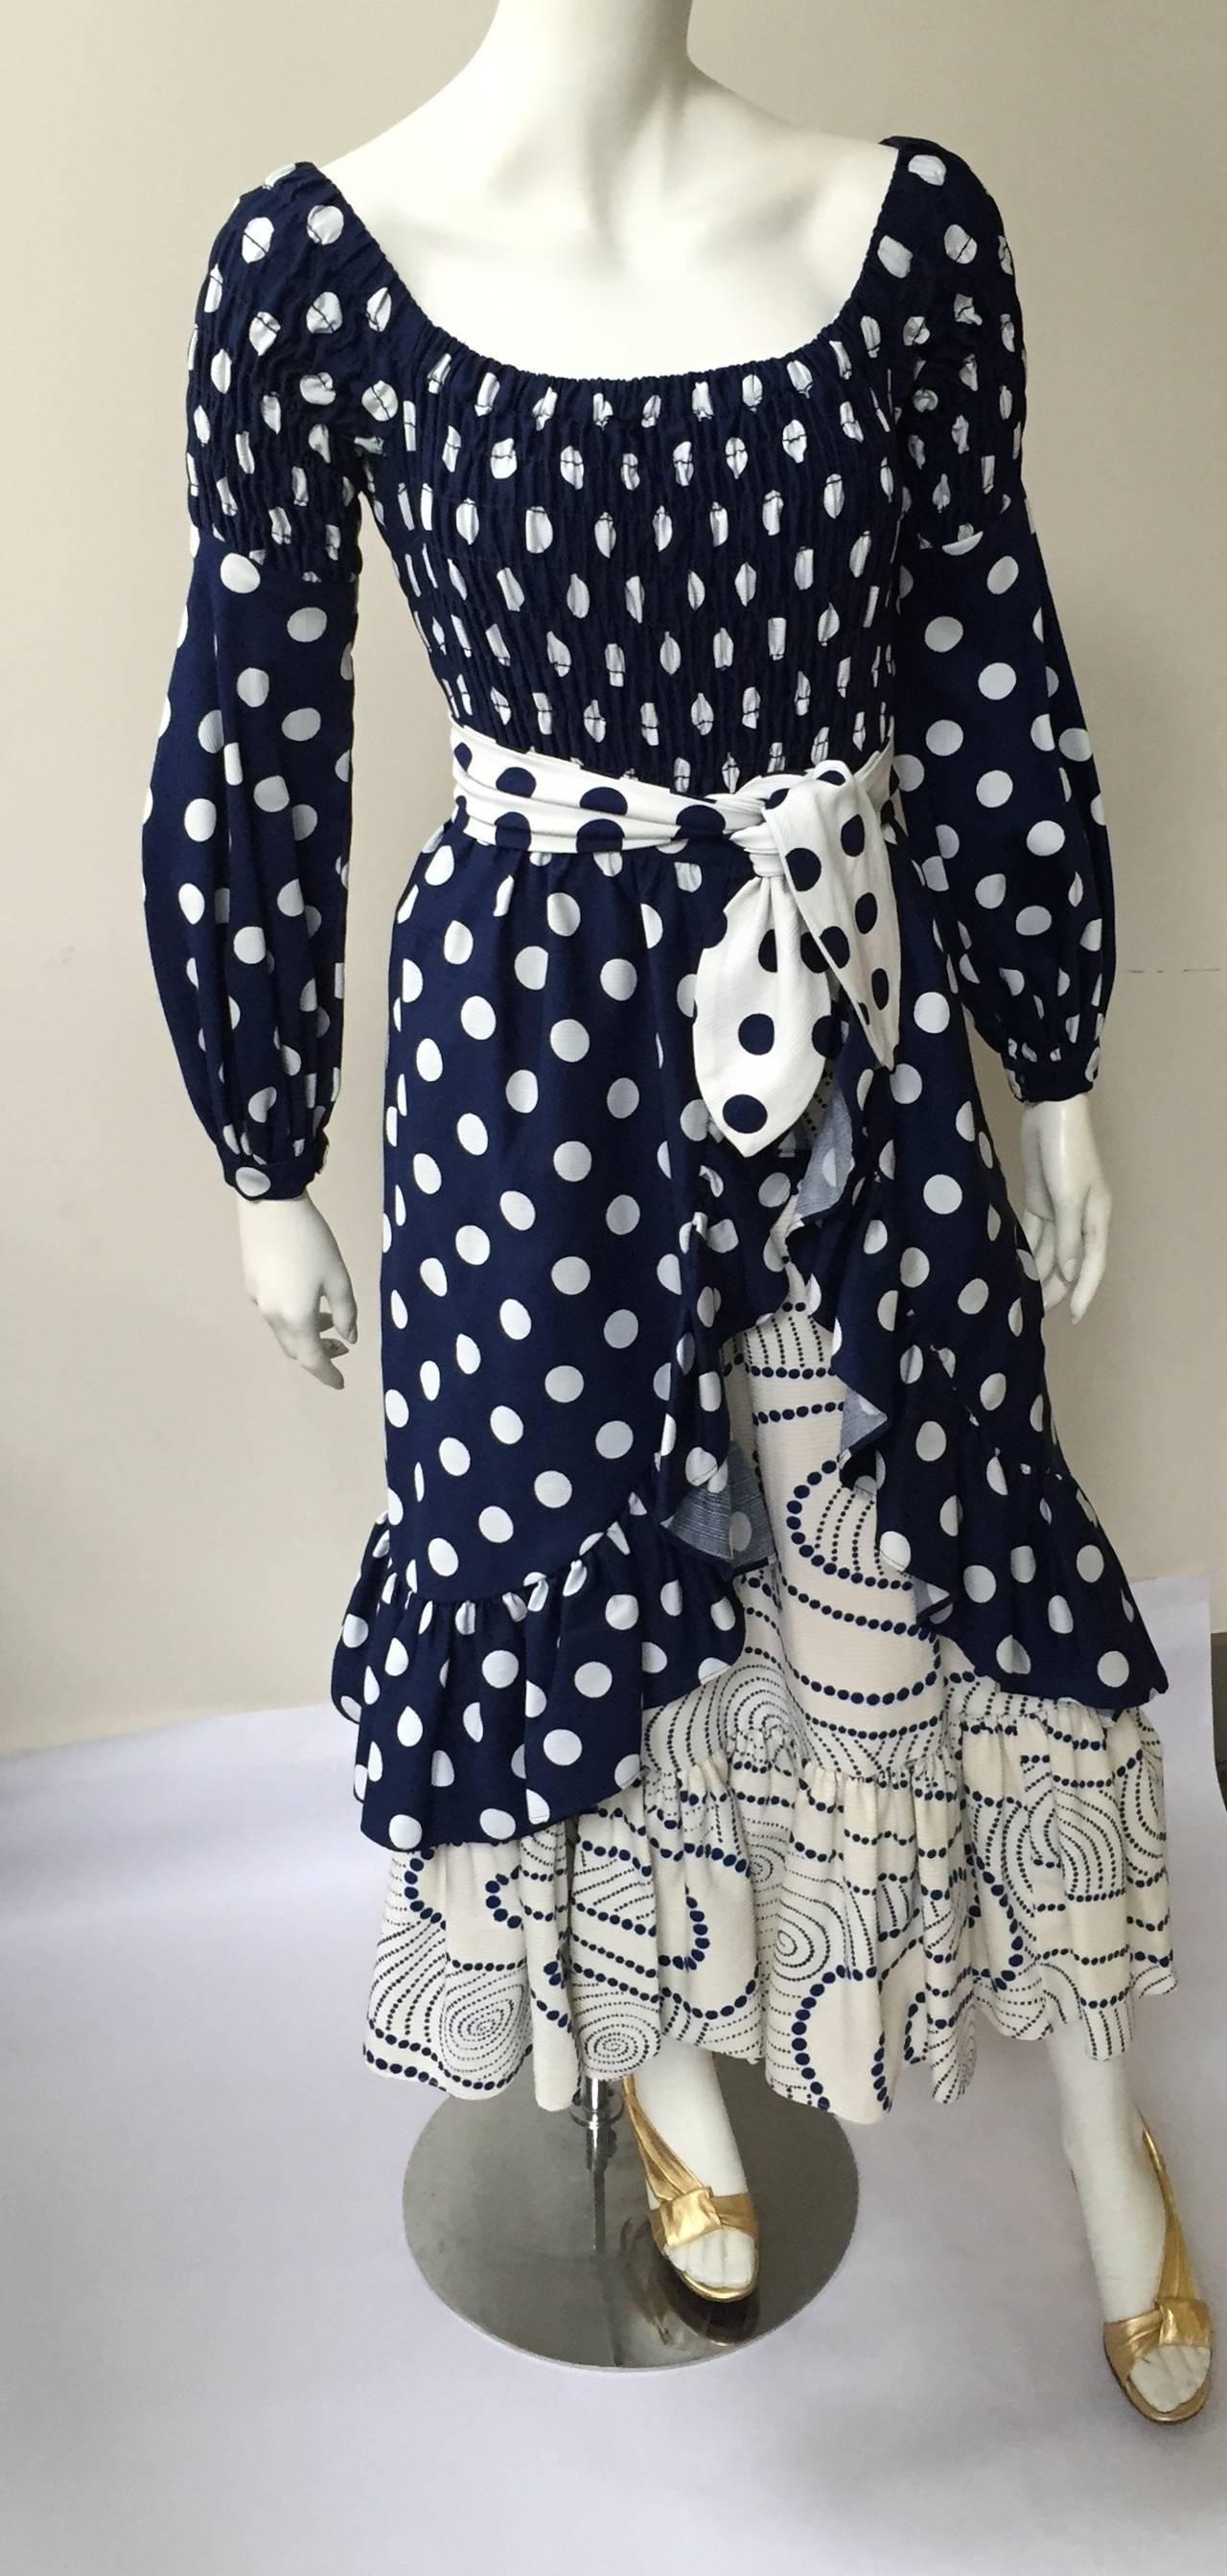 Oscar de la Renta 1970 polka dot Harper's Bazaar dress cover size 4. For Sale 3